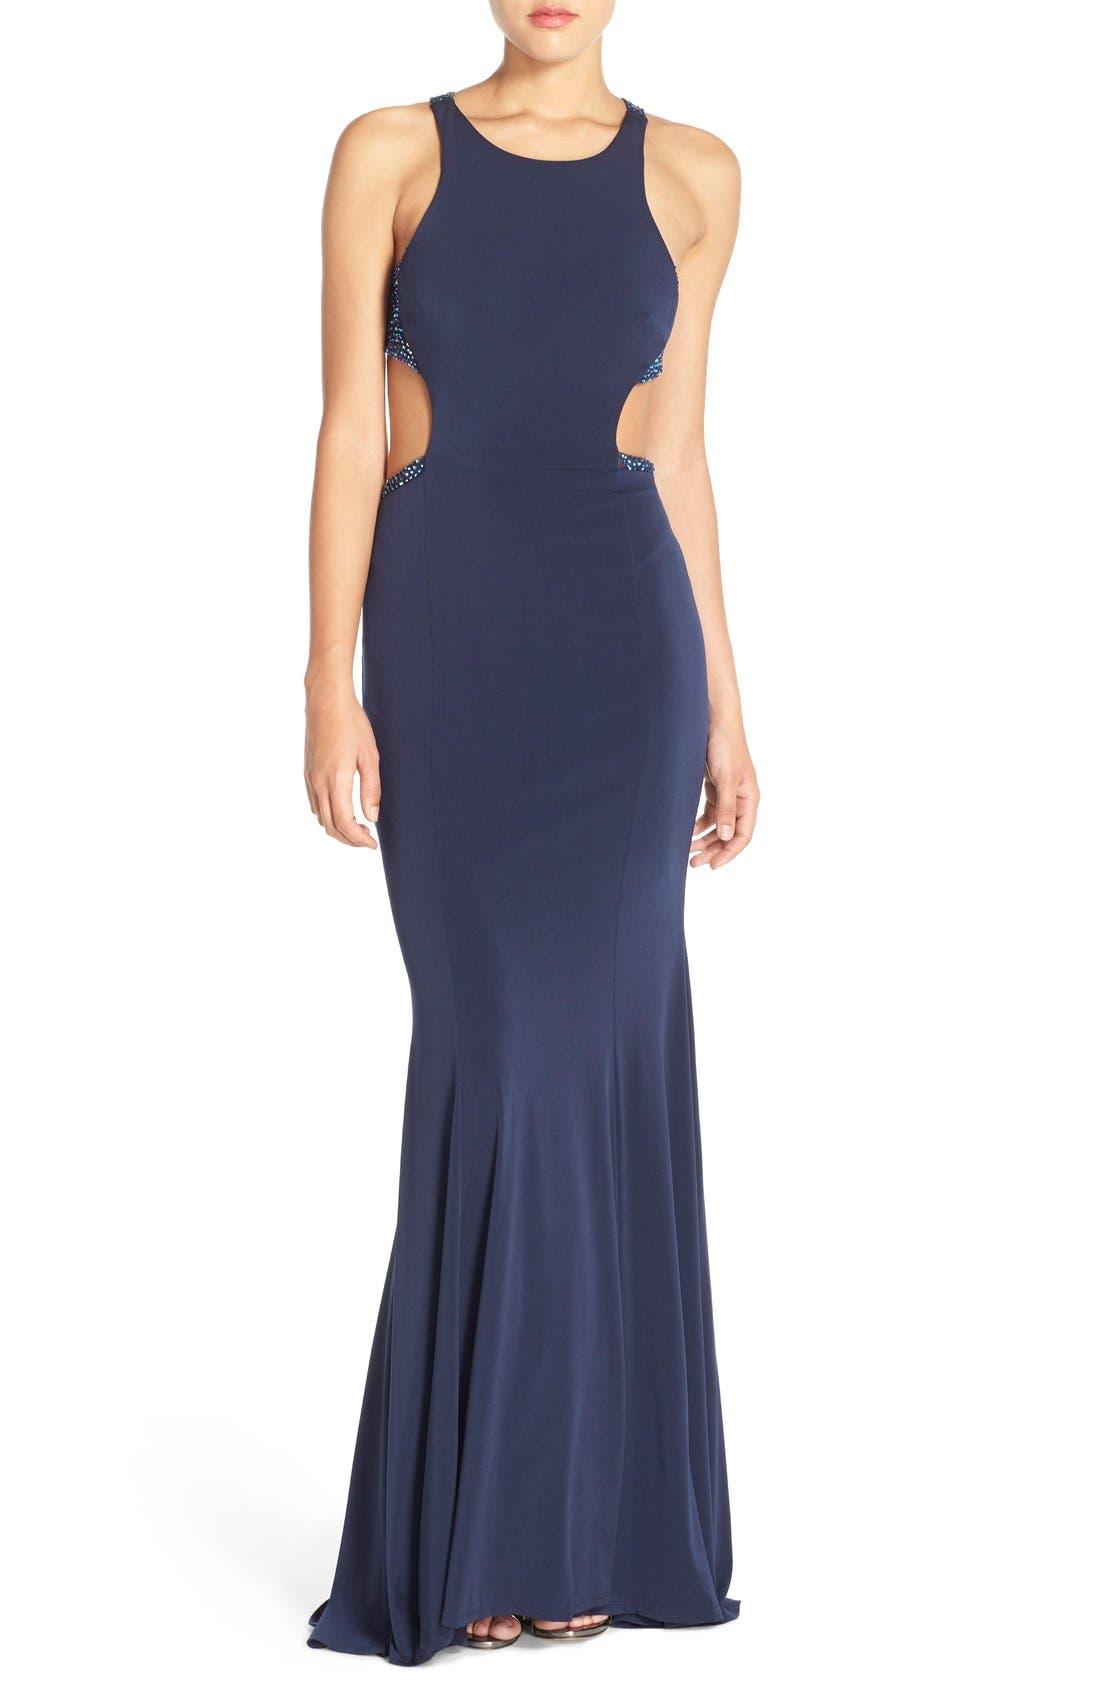 Alternate Image 1 Selected - La Femme Embellished Illusion Jersey Gown